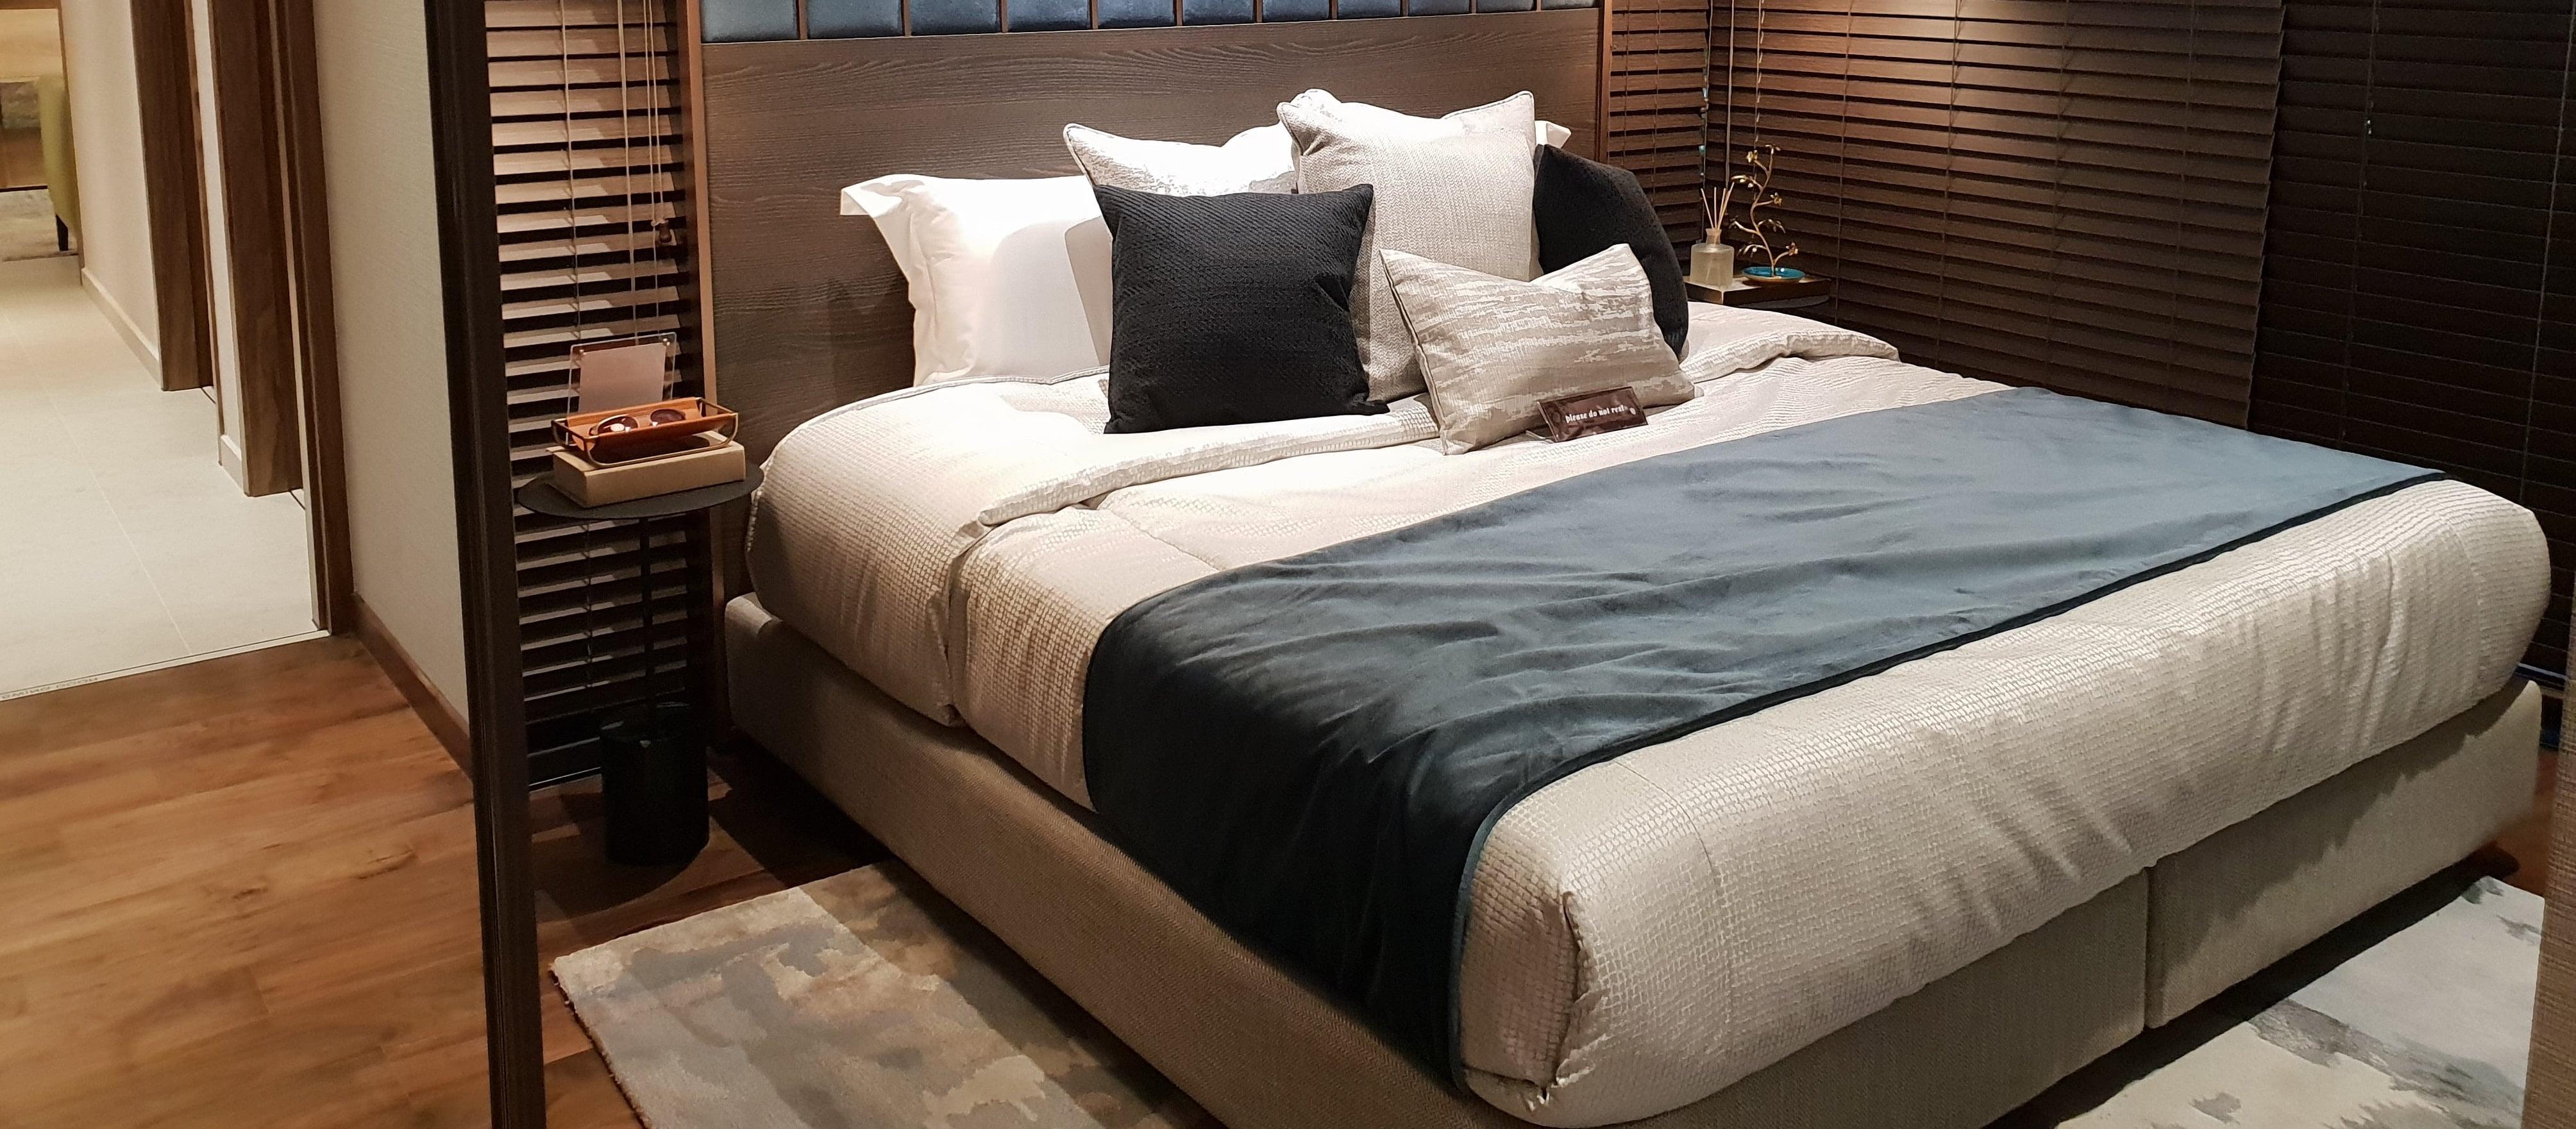 new concept 04fc4 86bd0 Best Cooling Memory Foam Mattress for Hot Sleepers - Sleep ...